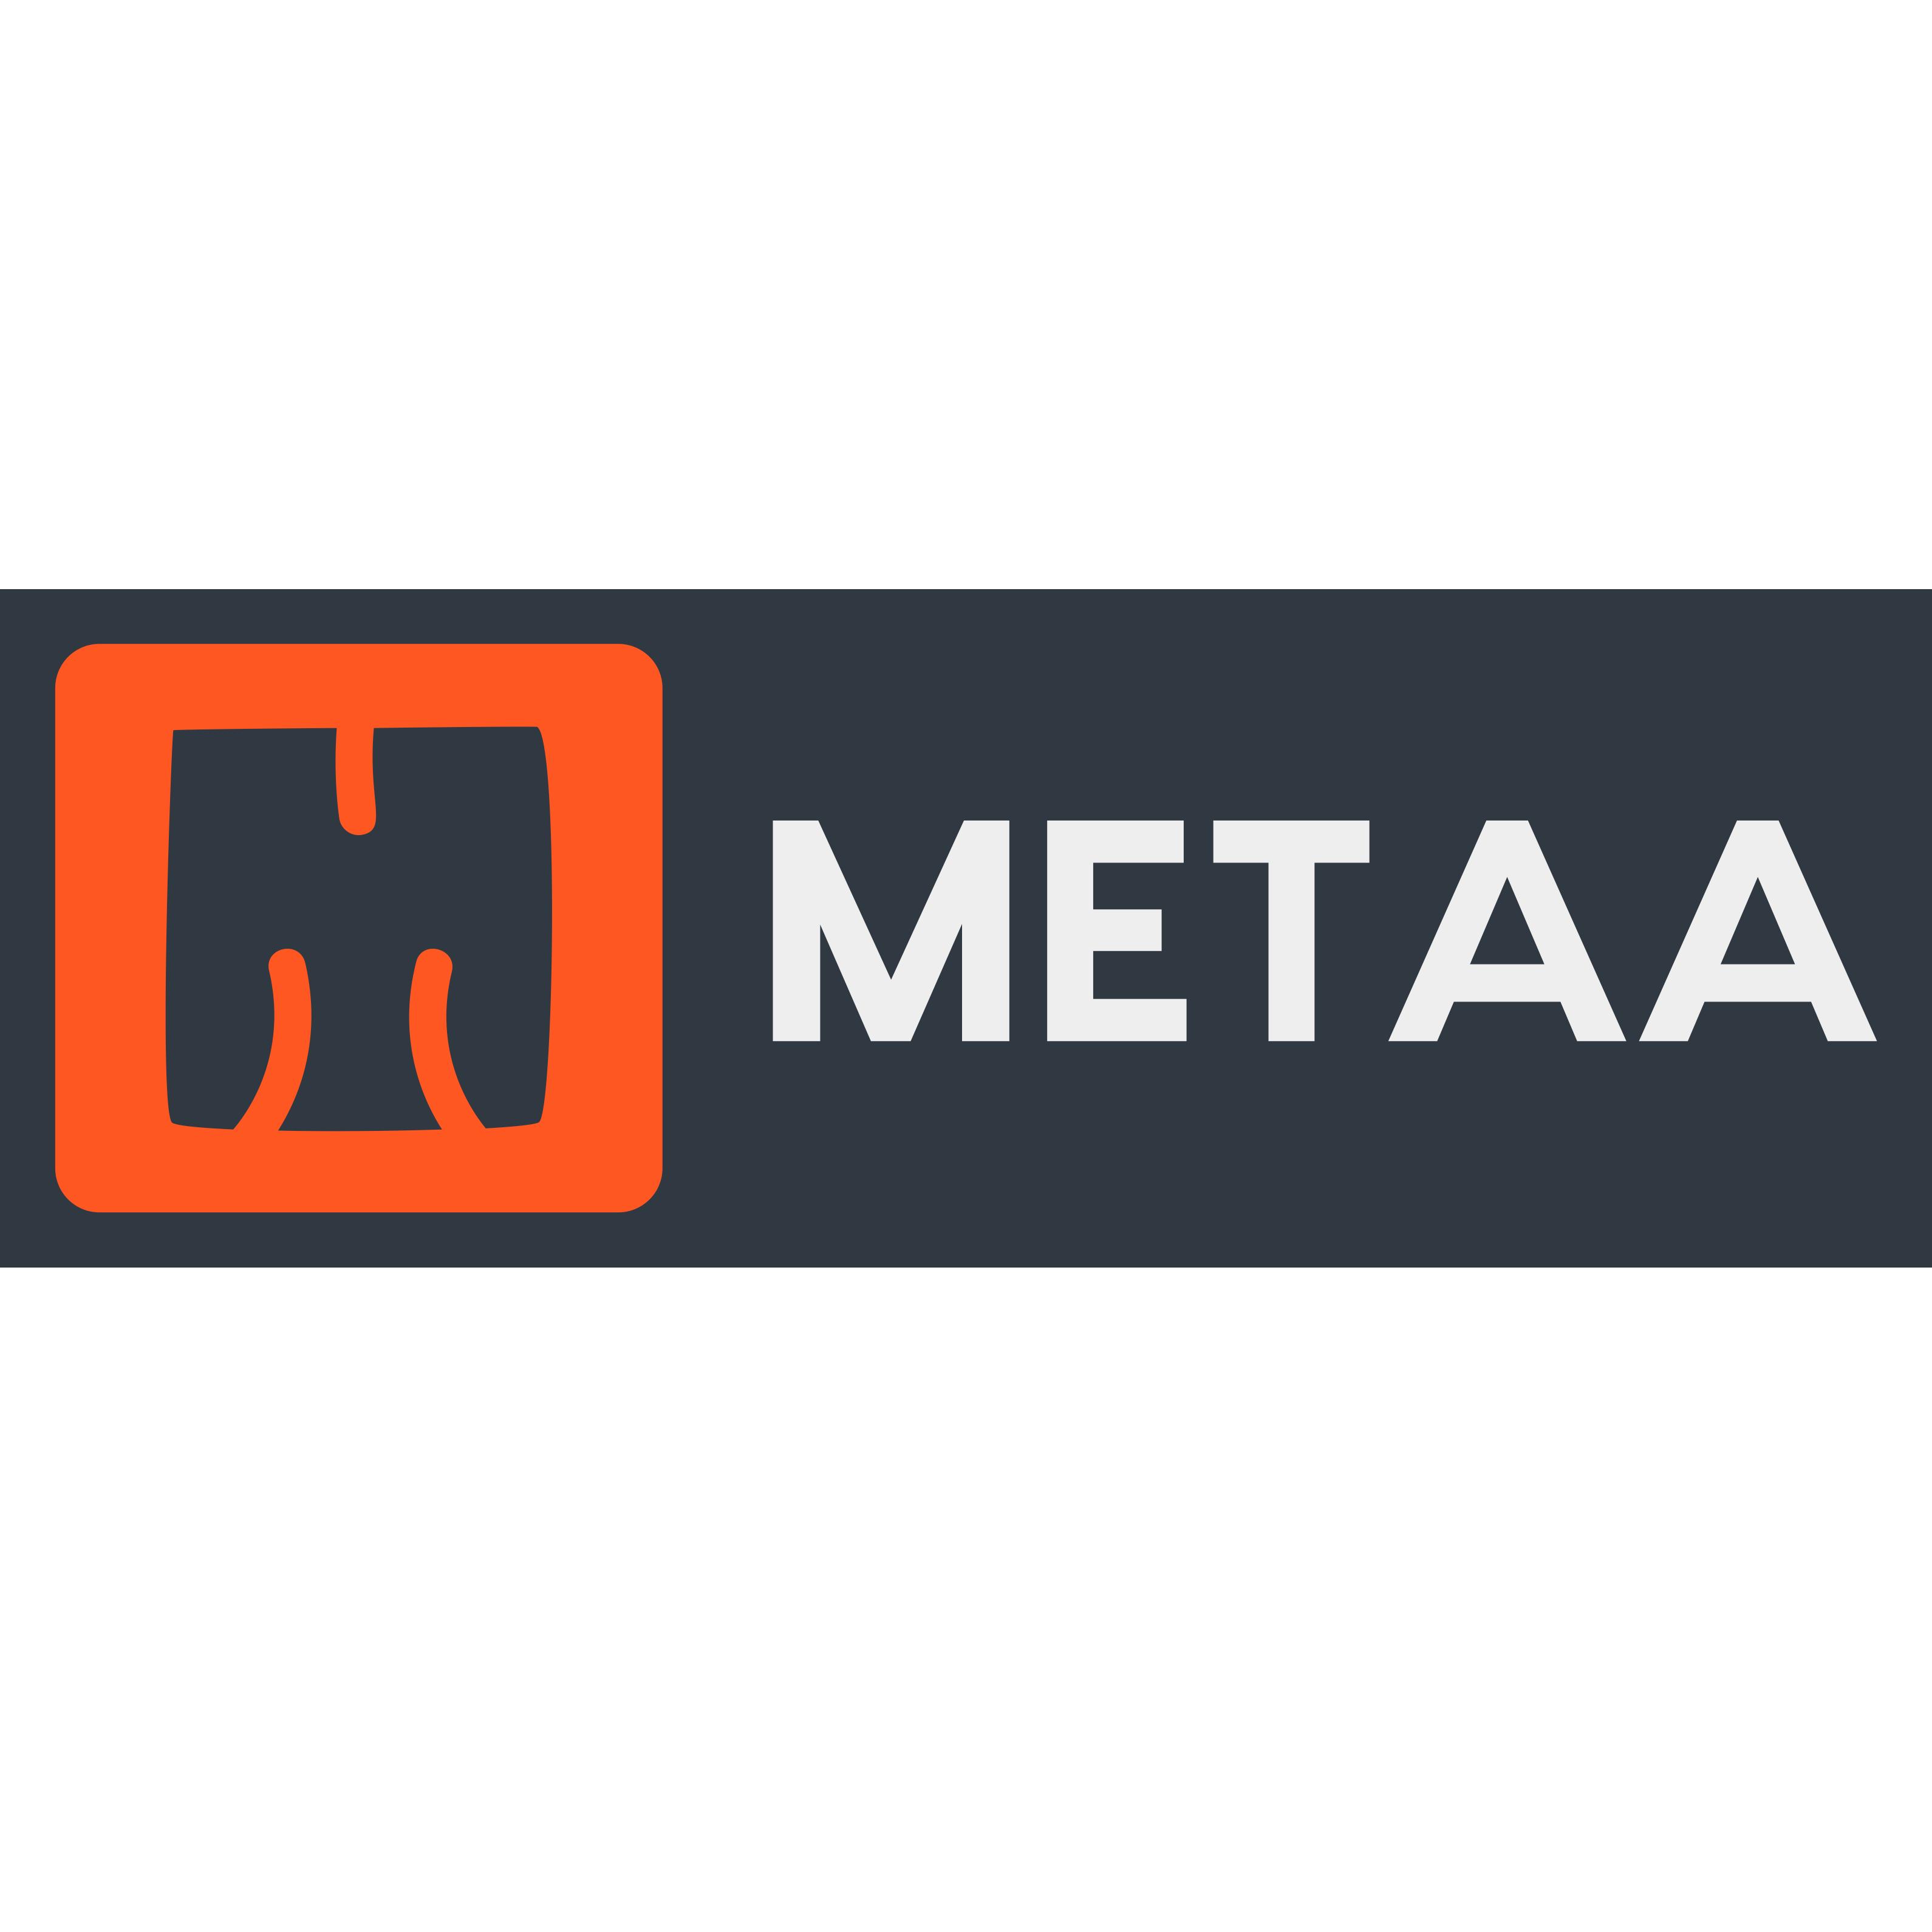 METAA logotype square format